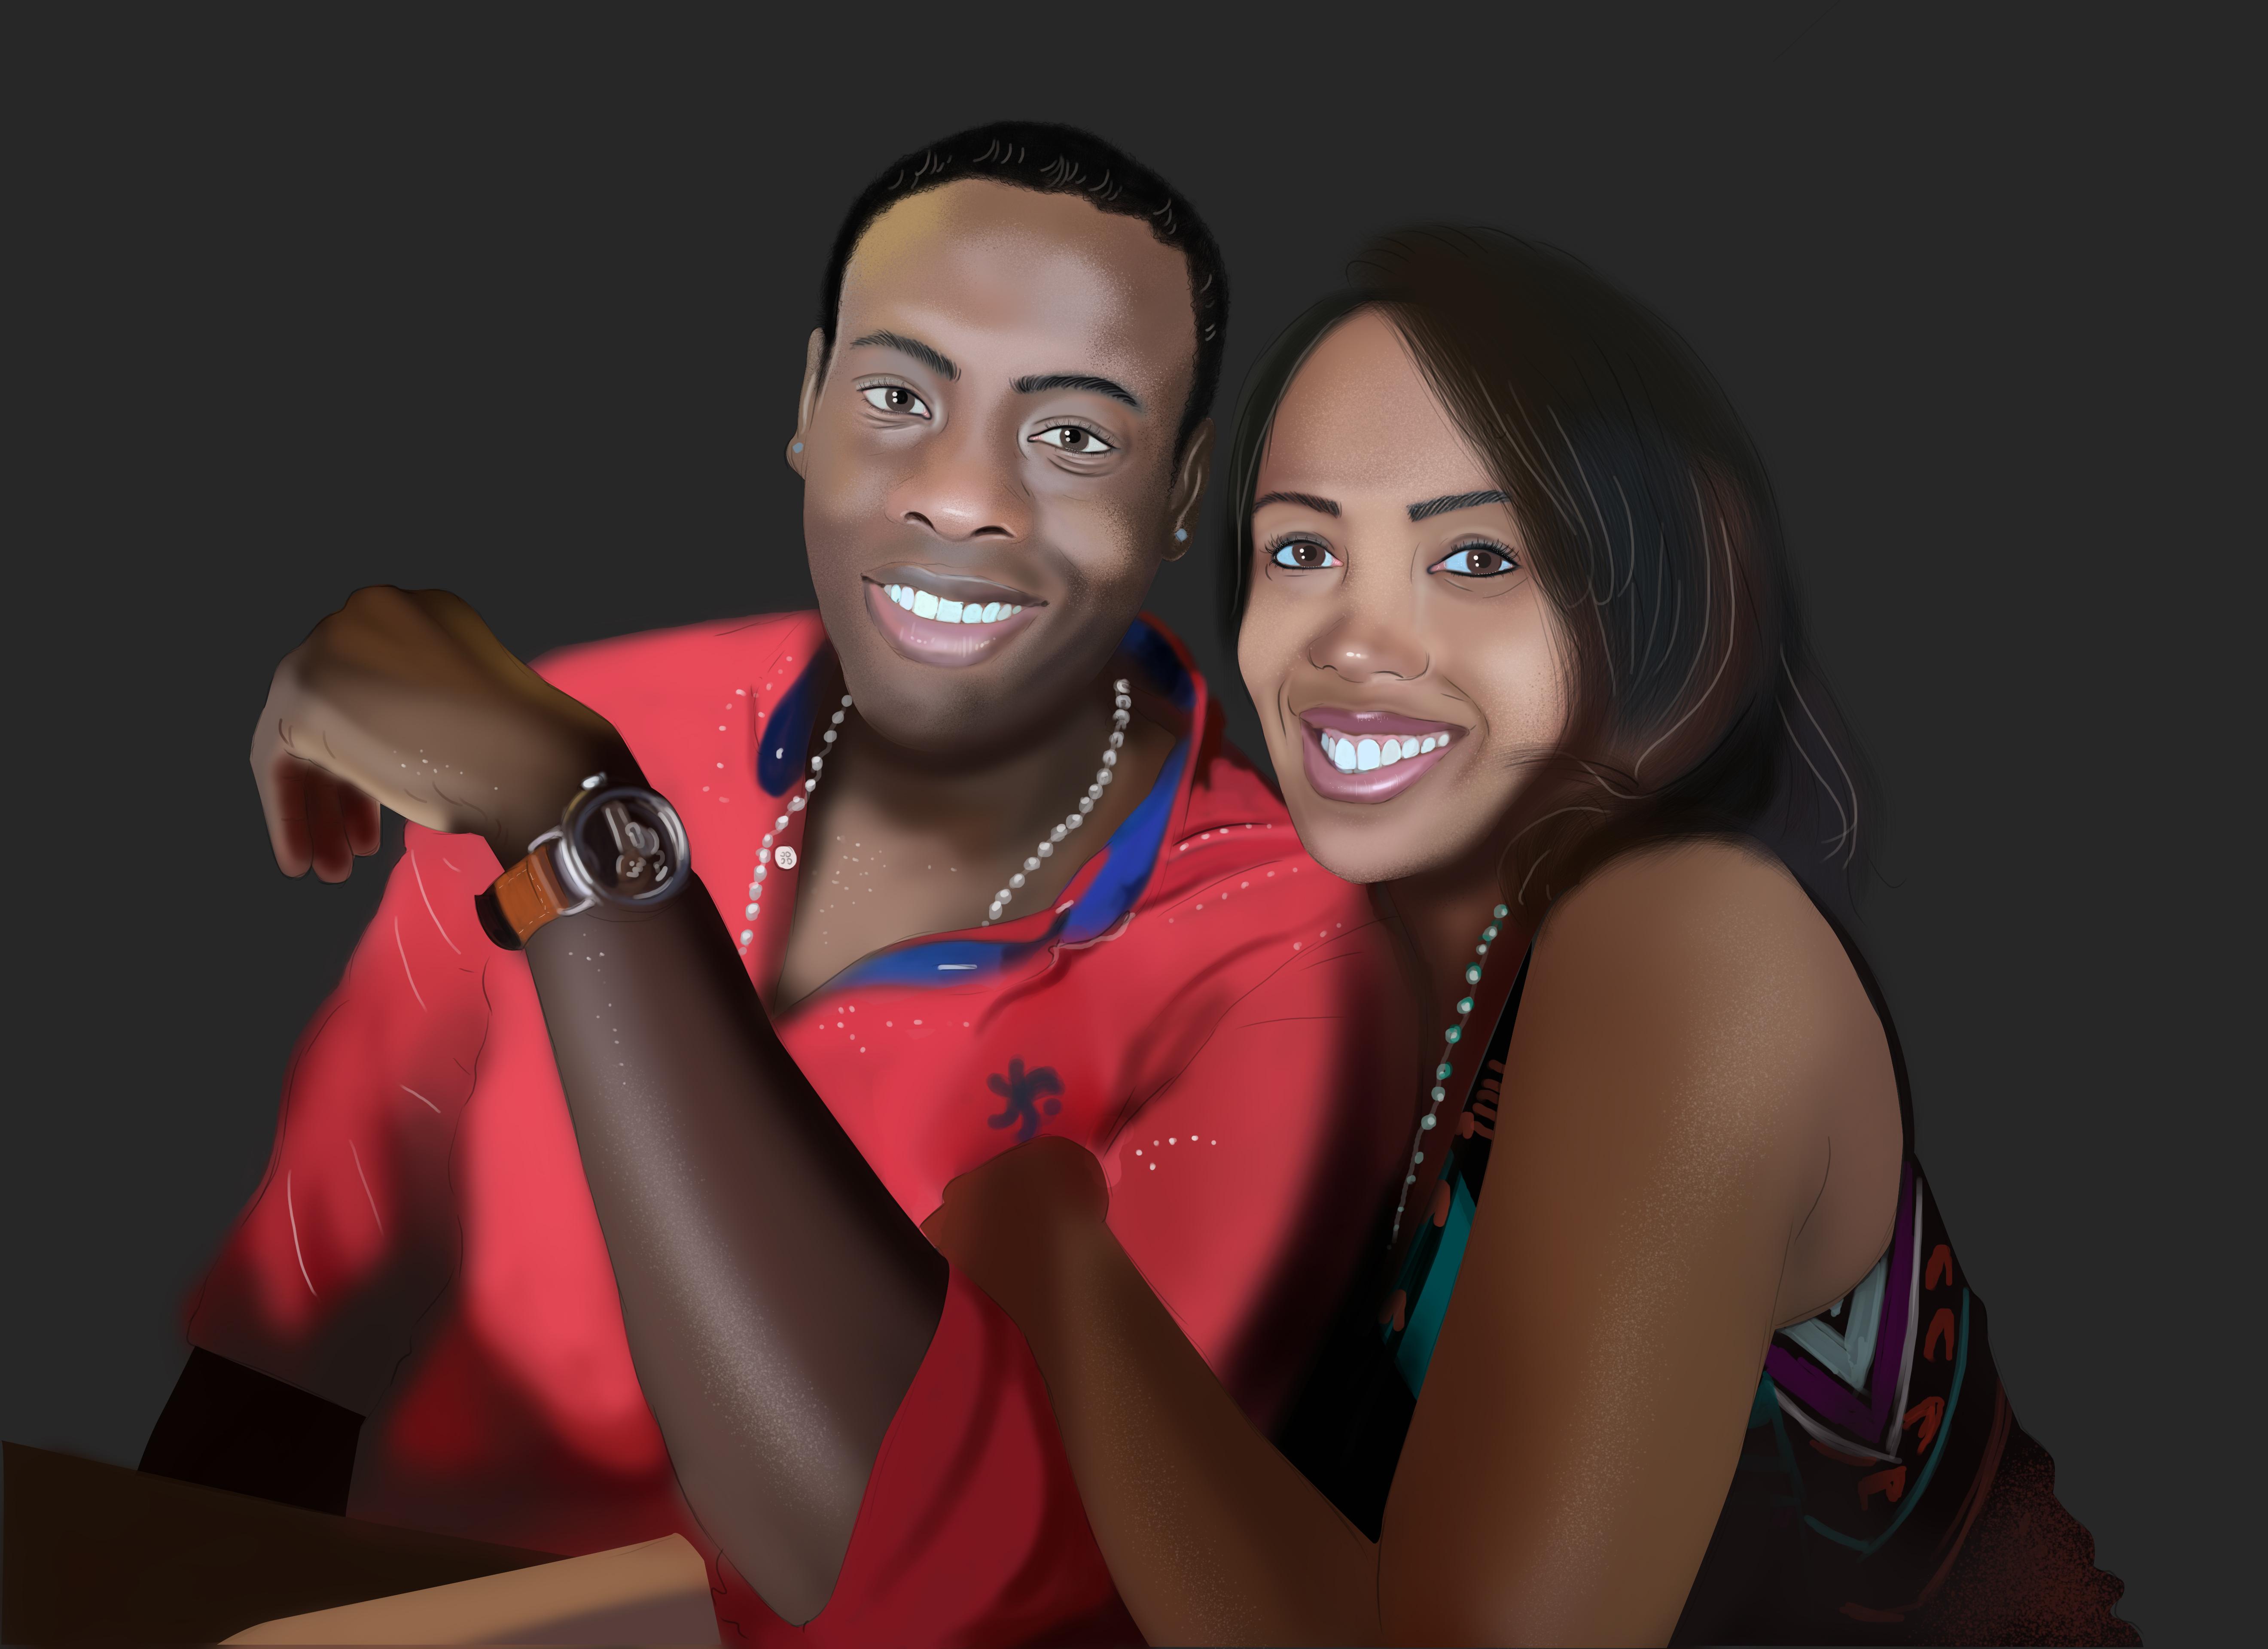 make a realistic digital portrait for gift